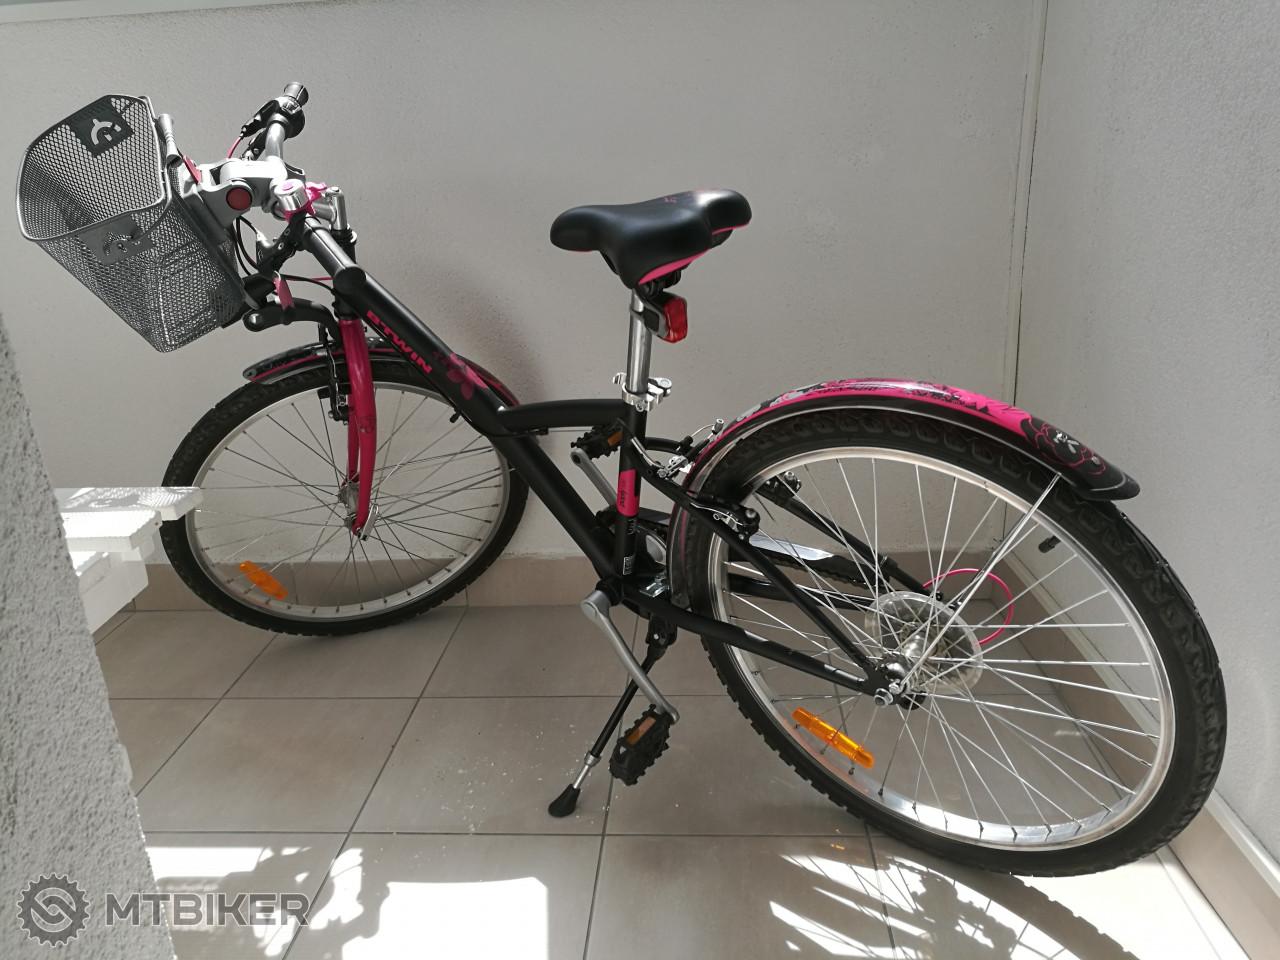 cc8c4dc187 Bicykle - Pevné a hardtail - Bazár MTBIKER